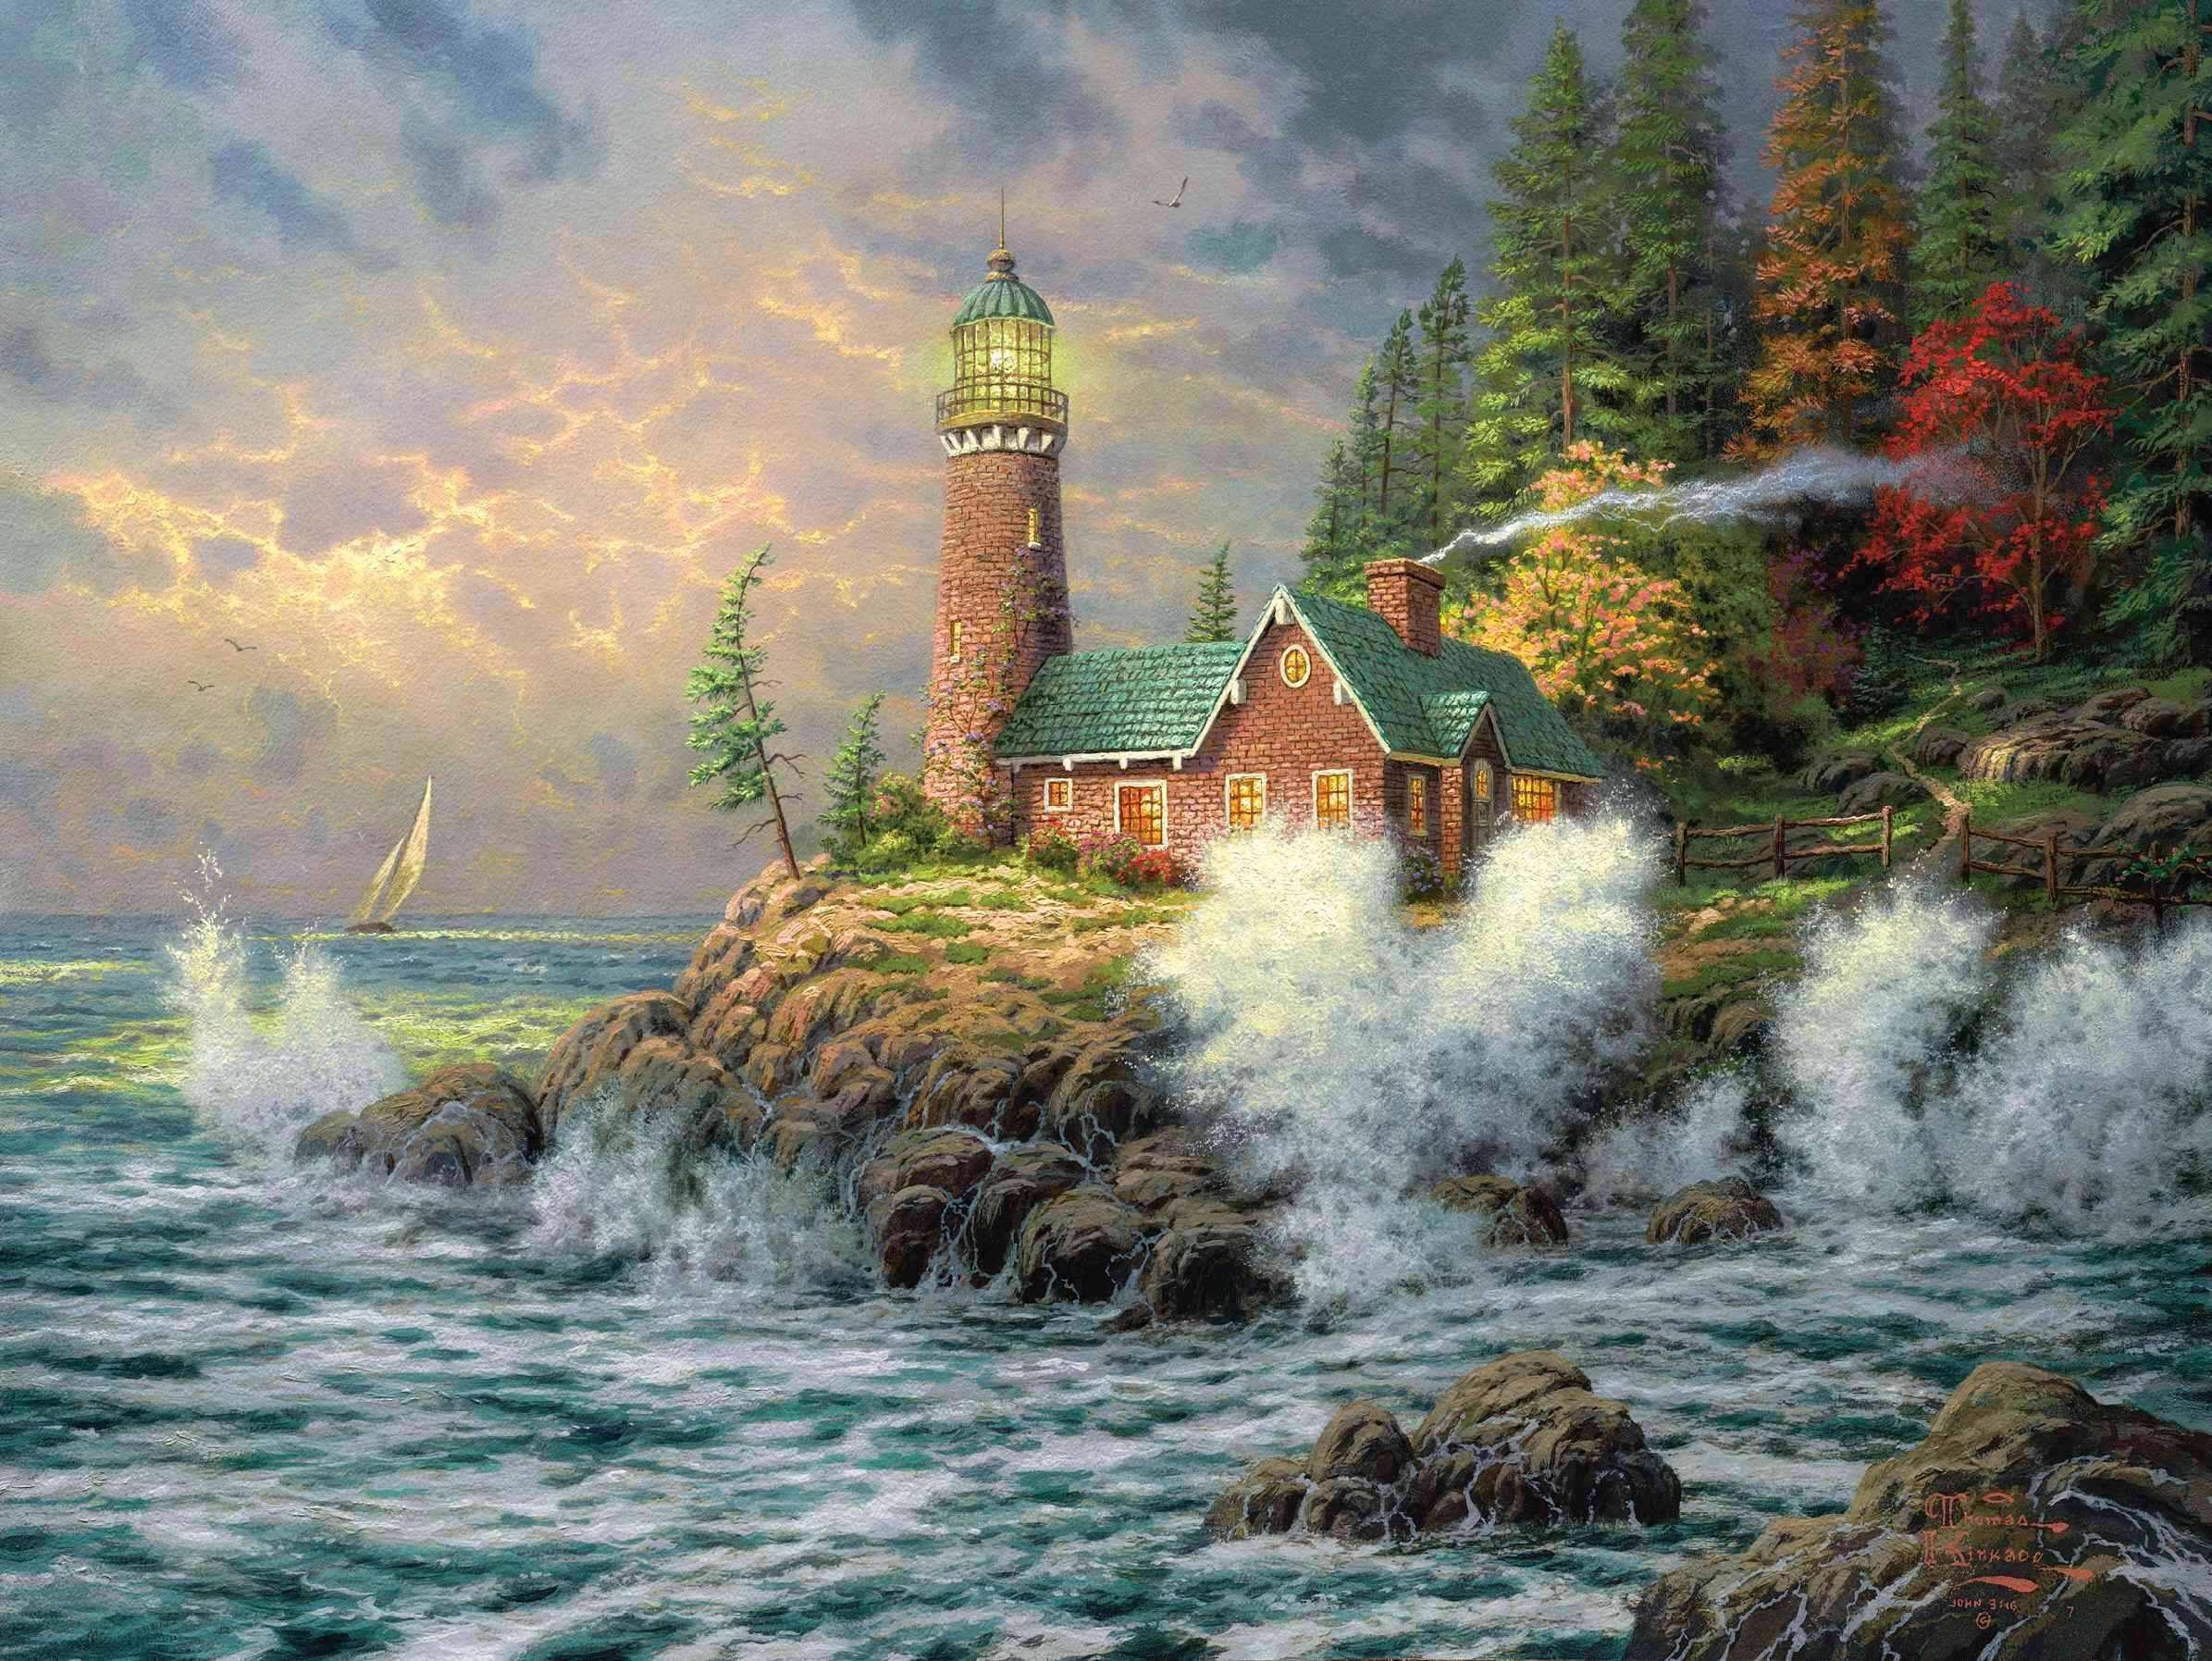 Wallpaper Thomas kinkade lighthuse sea paint wave desktop 2391x1795